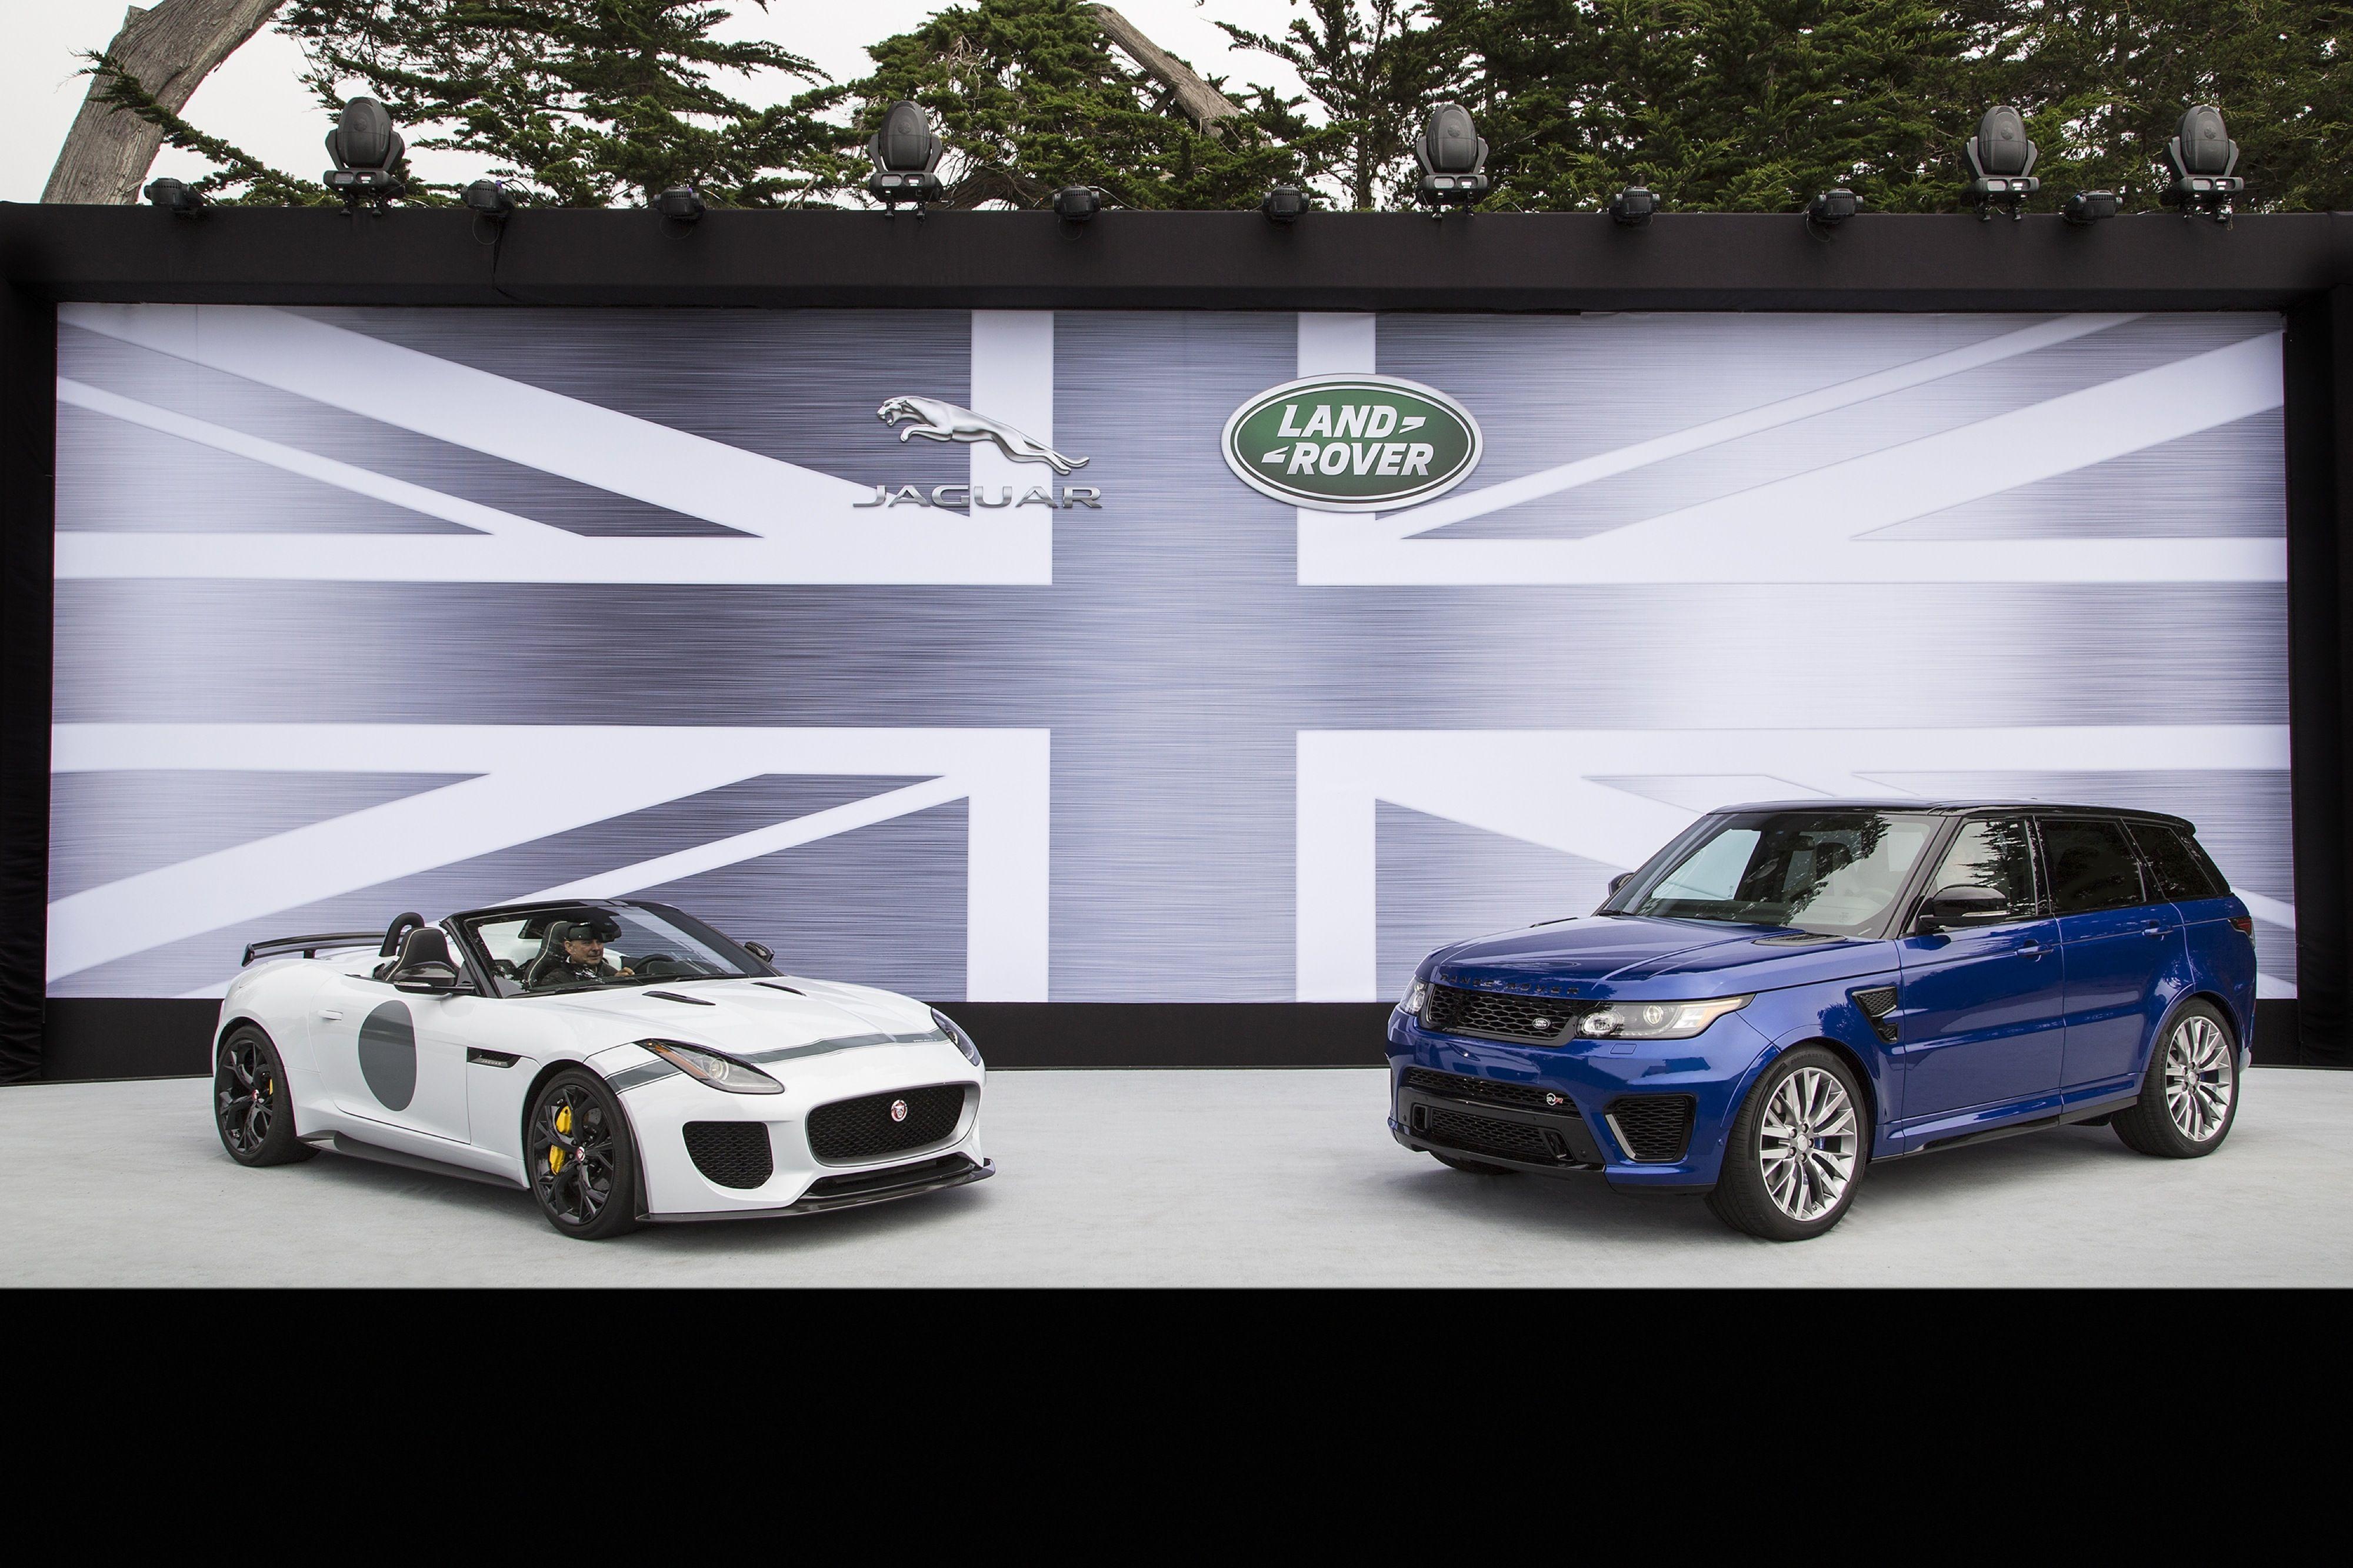 Jaguar and land rover top range will have bmw v8 engines